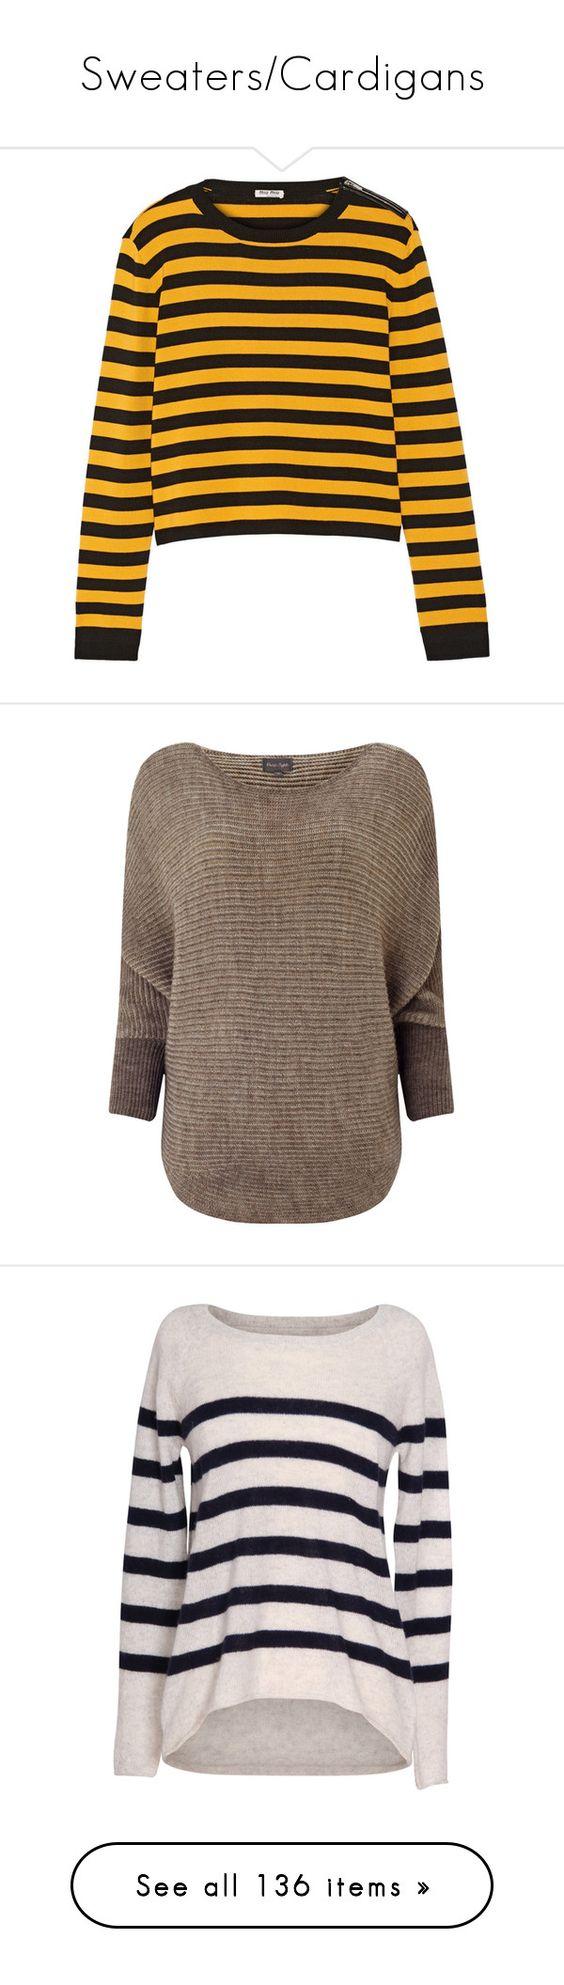 """Sweaters/Cardigans"" by asparkleinhereye on Polyvore featuring tops, sweaters, miu miu, jumpers, miu miu top, striped top, zipper sweater, wool-blend sweater, zipper top and brown"